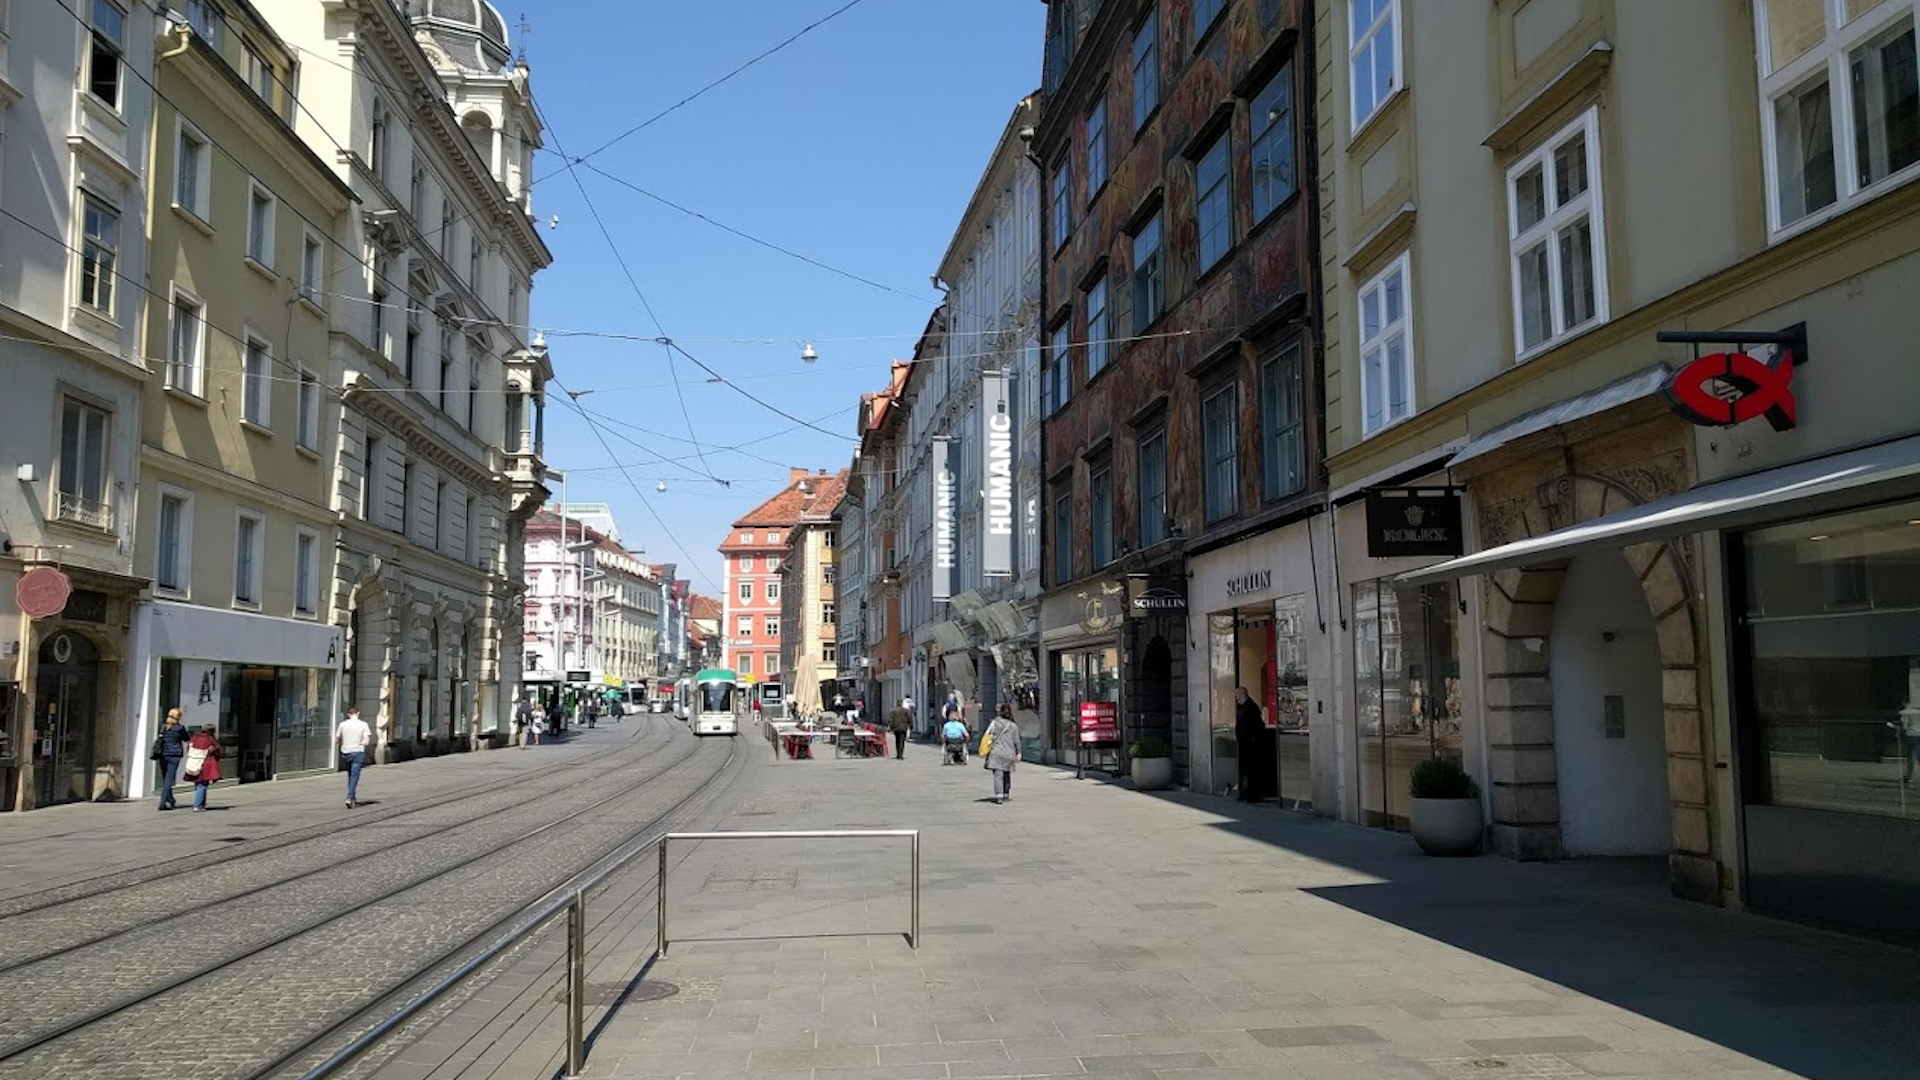 Bild-Graz-Straßenbahn-Herrengasse-Hauptplatz-Corona Krise-Normalfahrplan-Covid 19-2020-Steiermark-Graz Linien